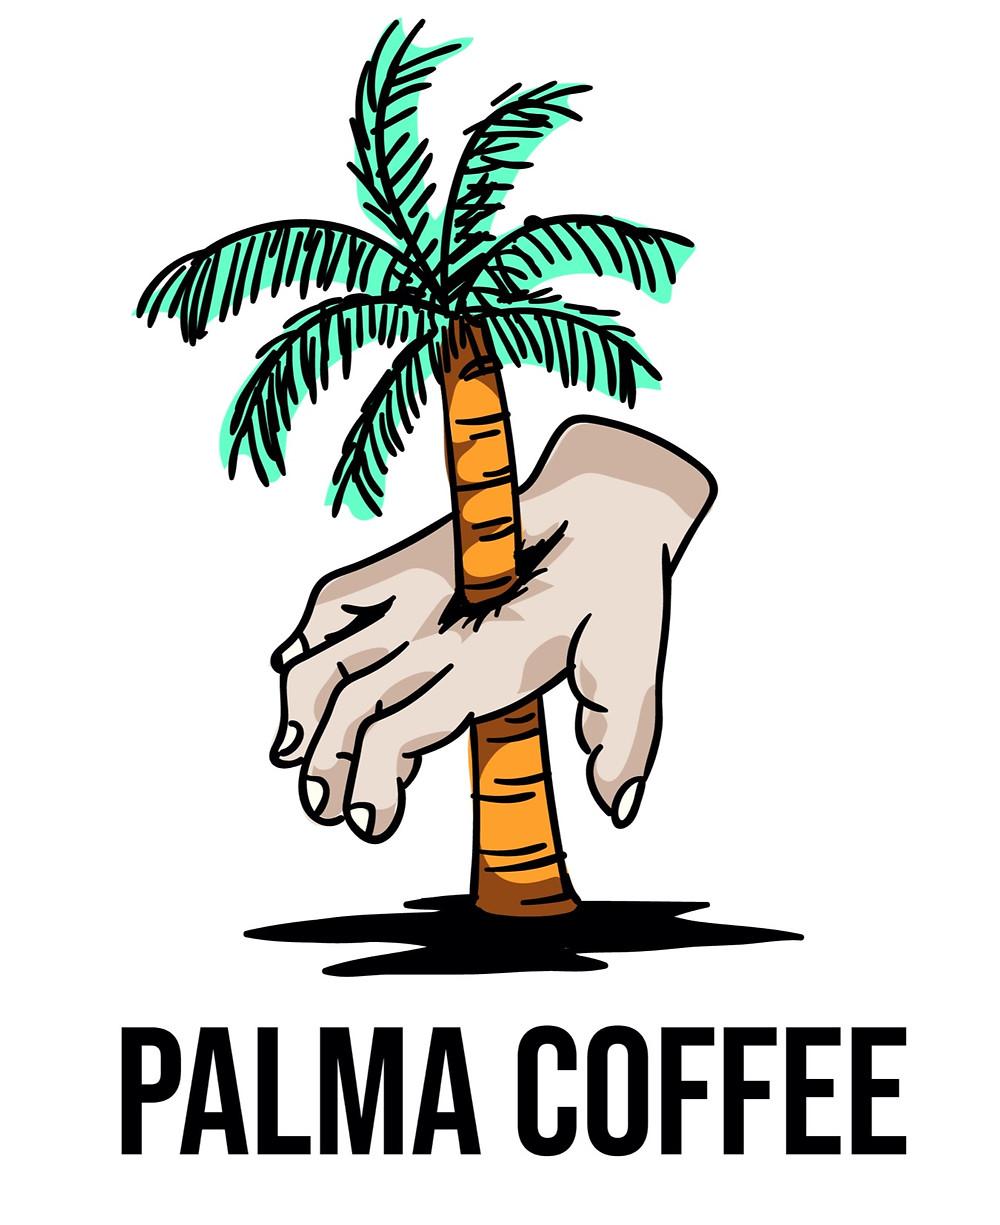 Palma coffee logo